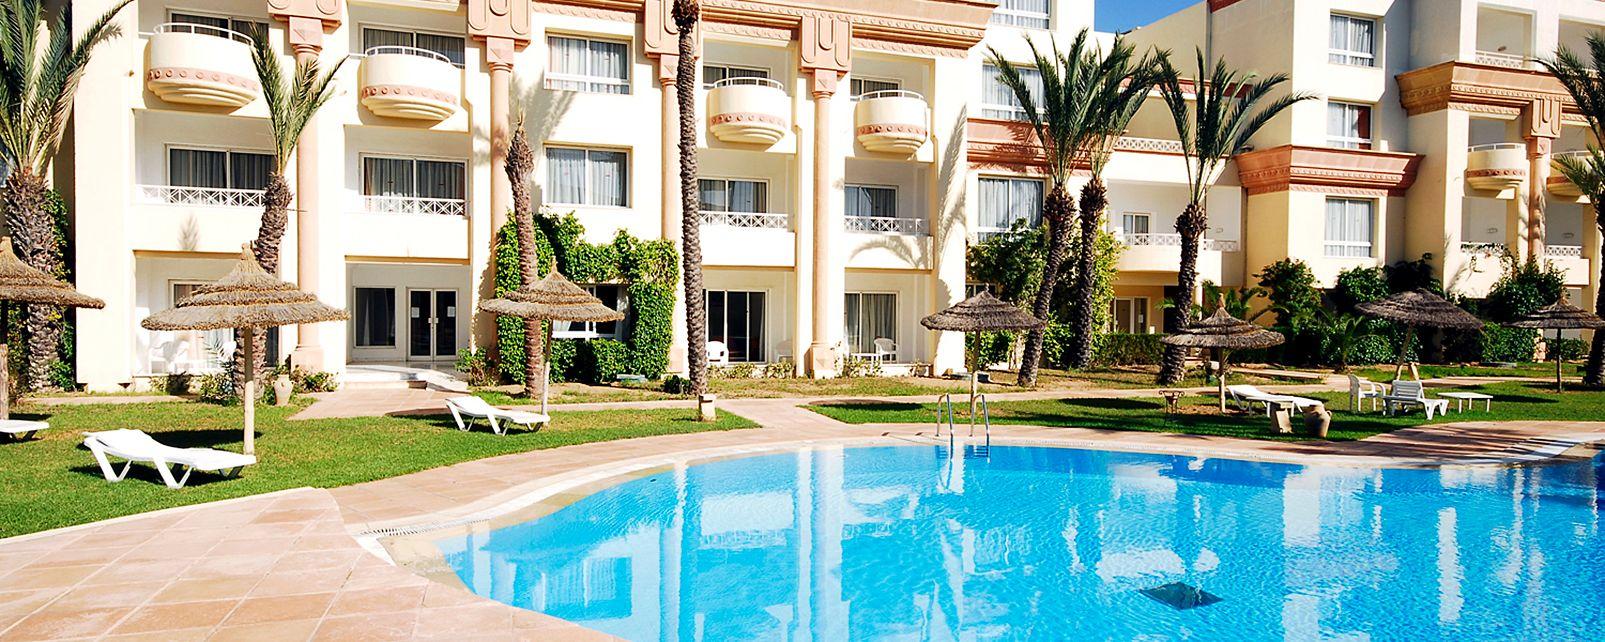 Hôtel Tunistar Marina Palace